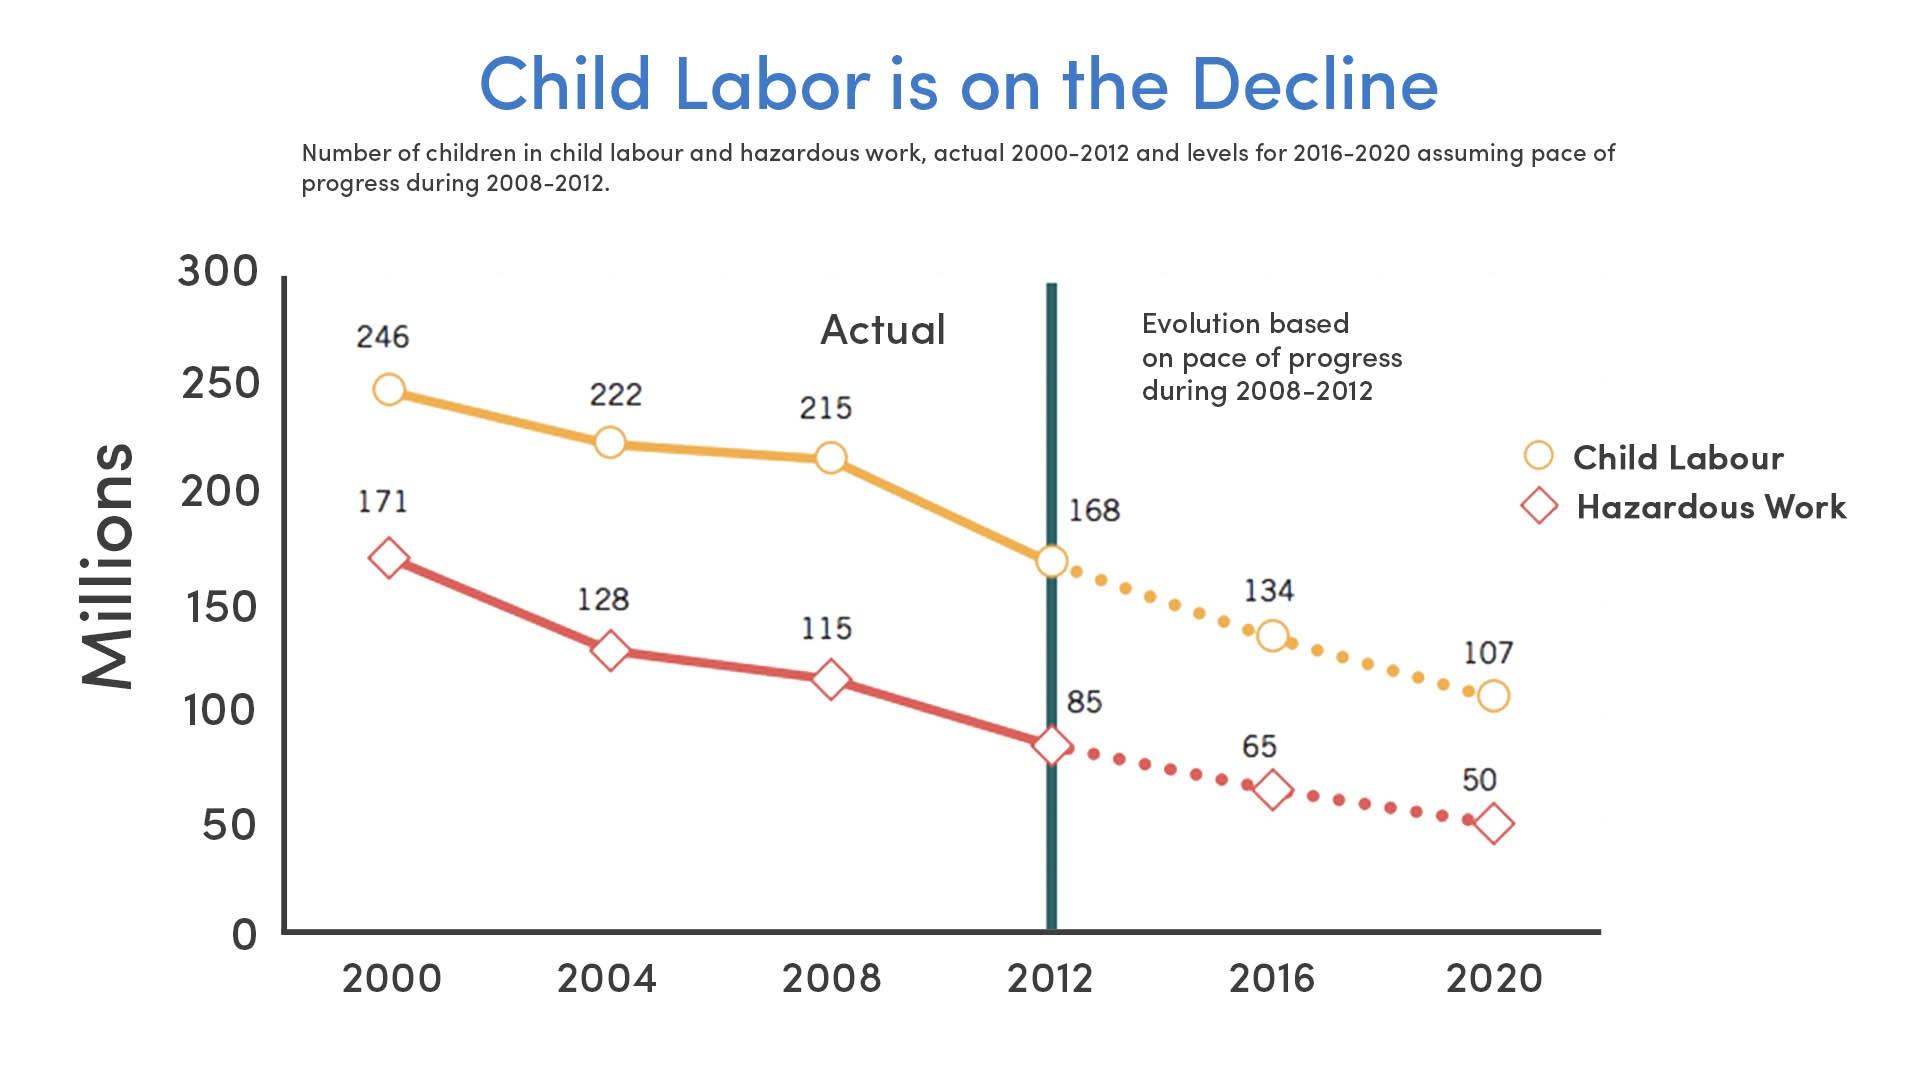 Child Labor on the Decline